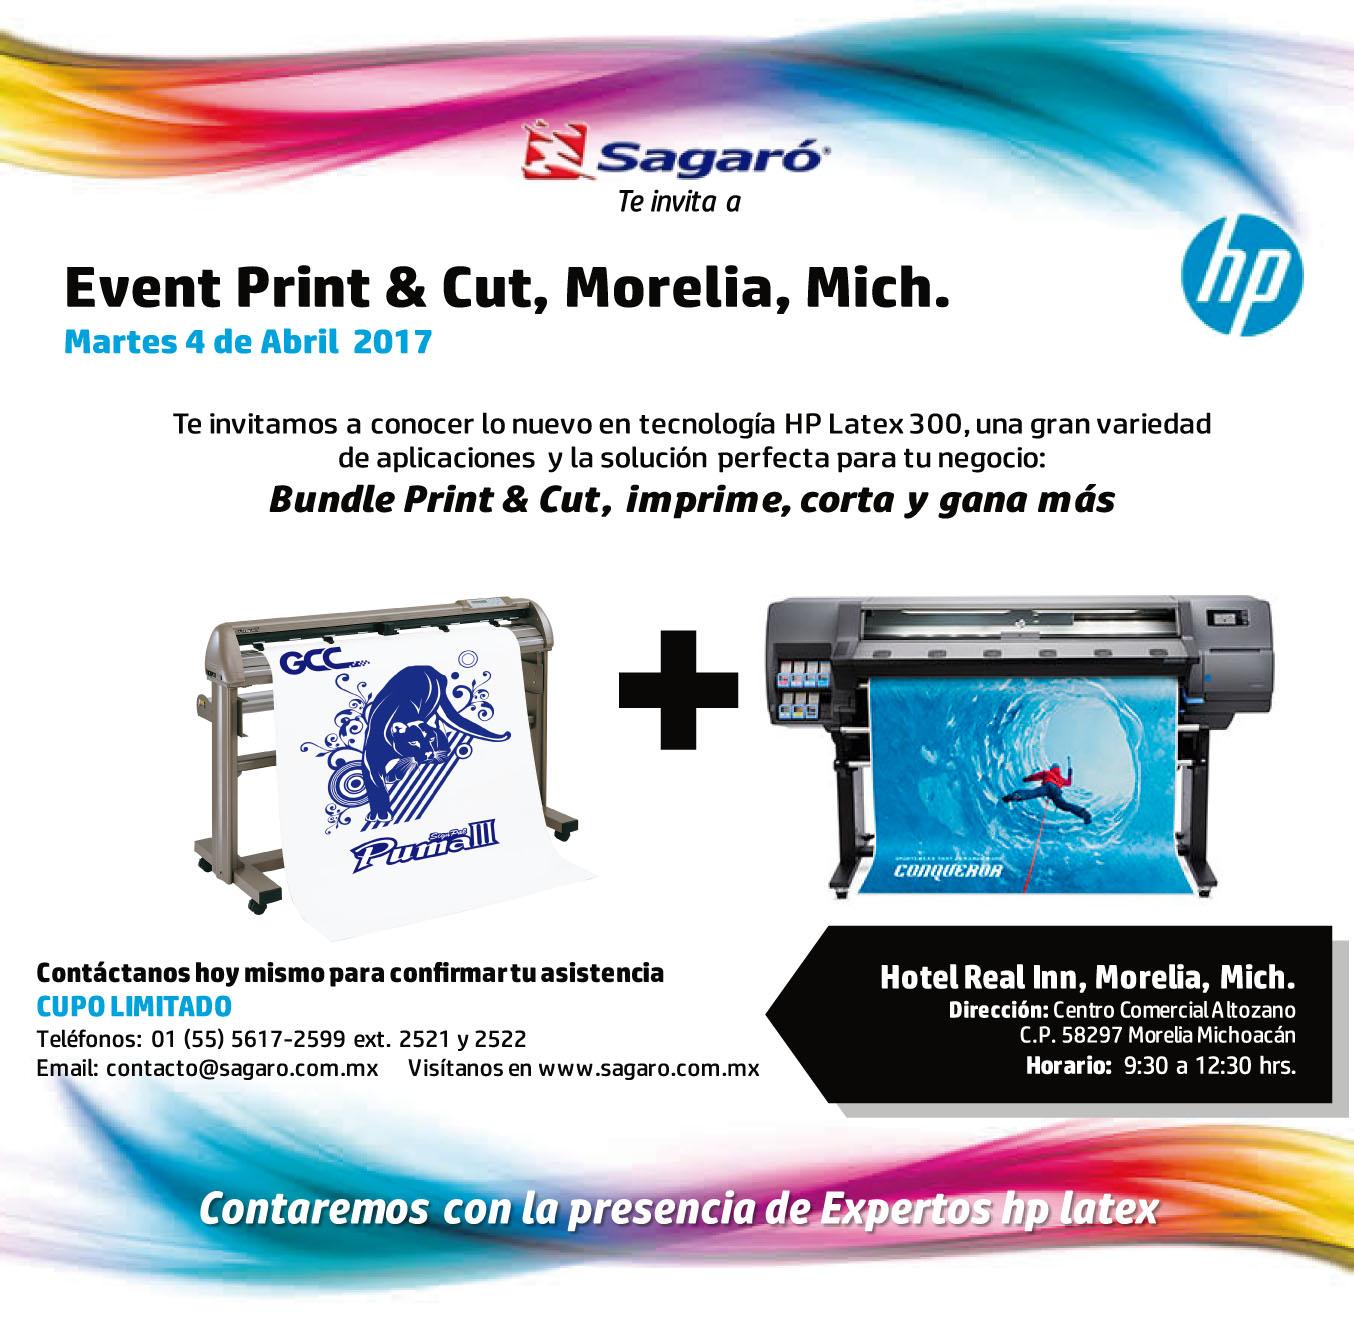 Event Print & Cut Morelia